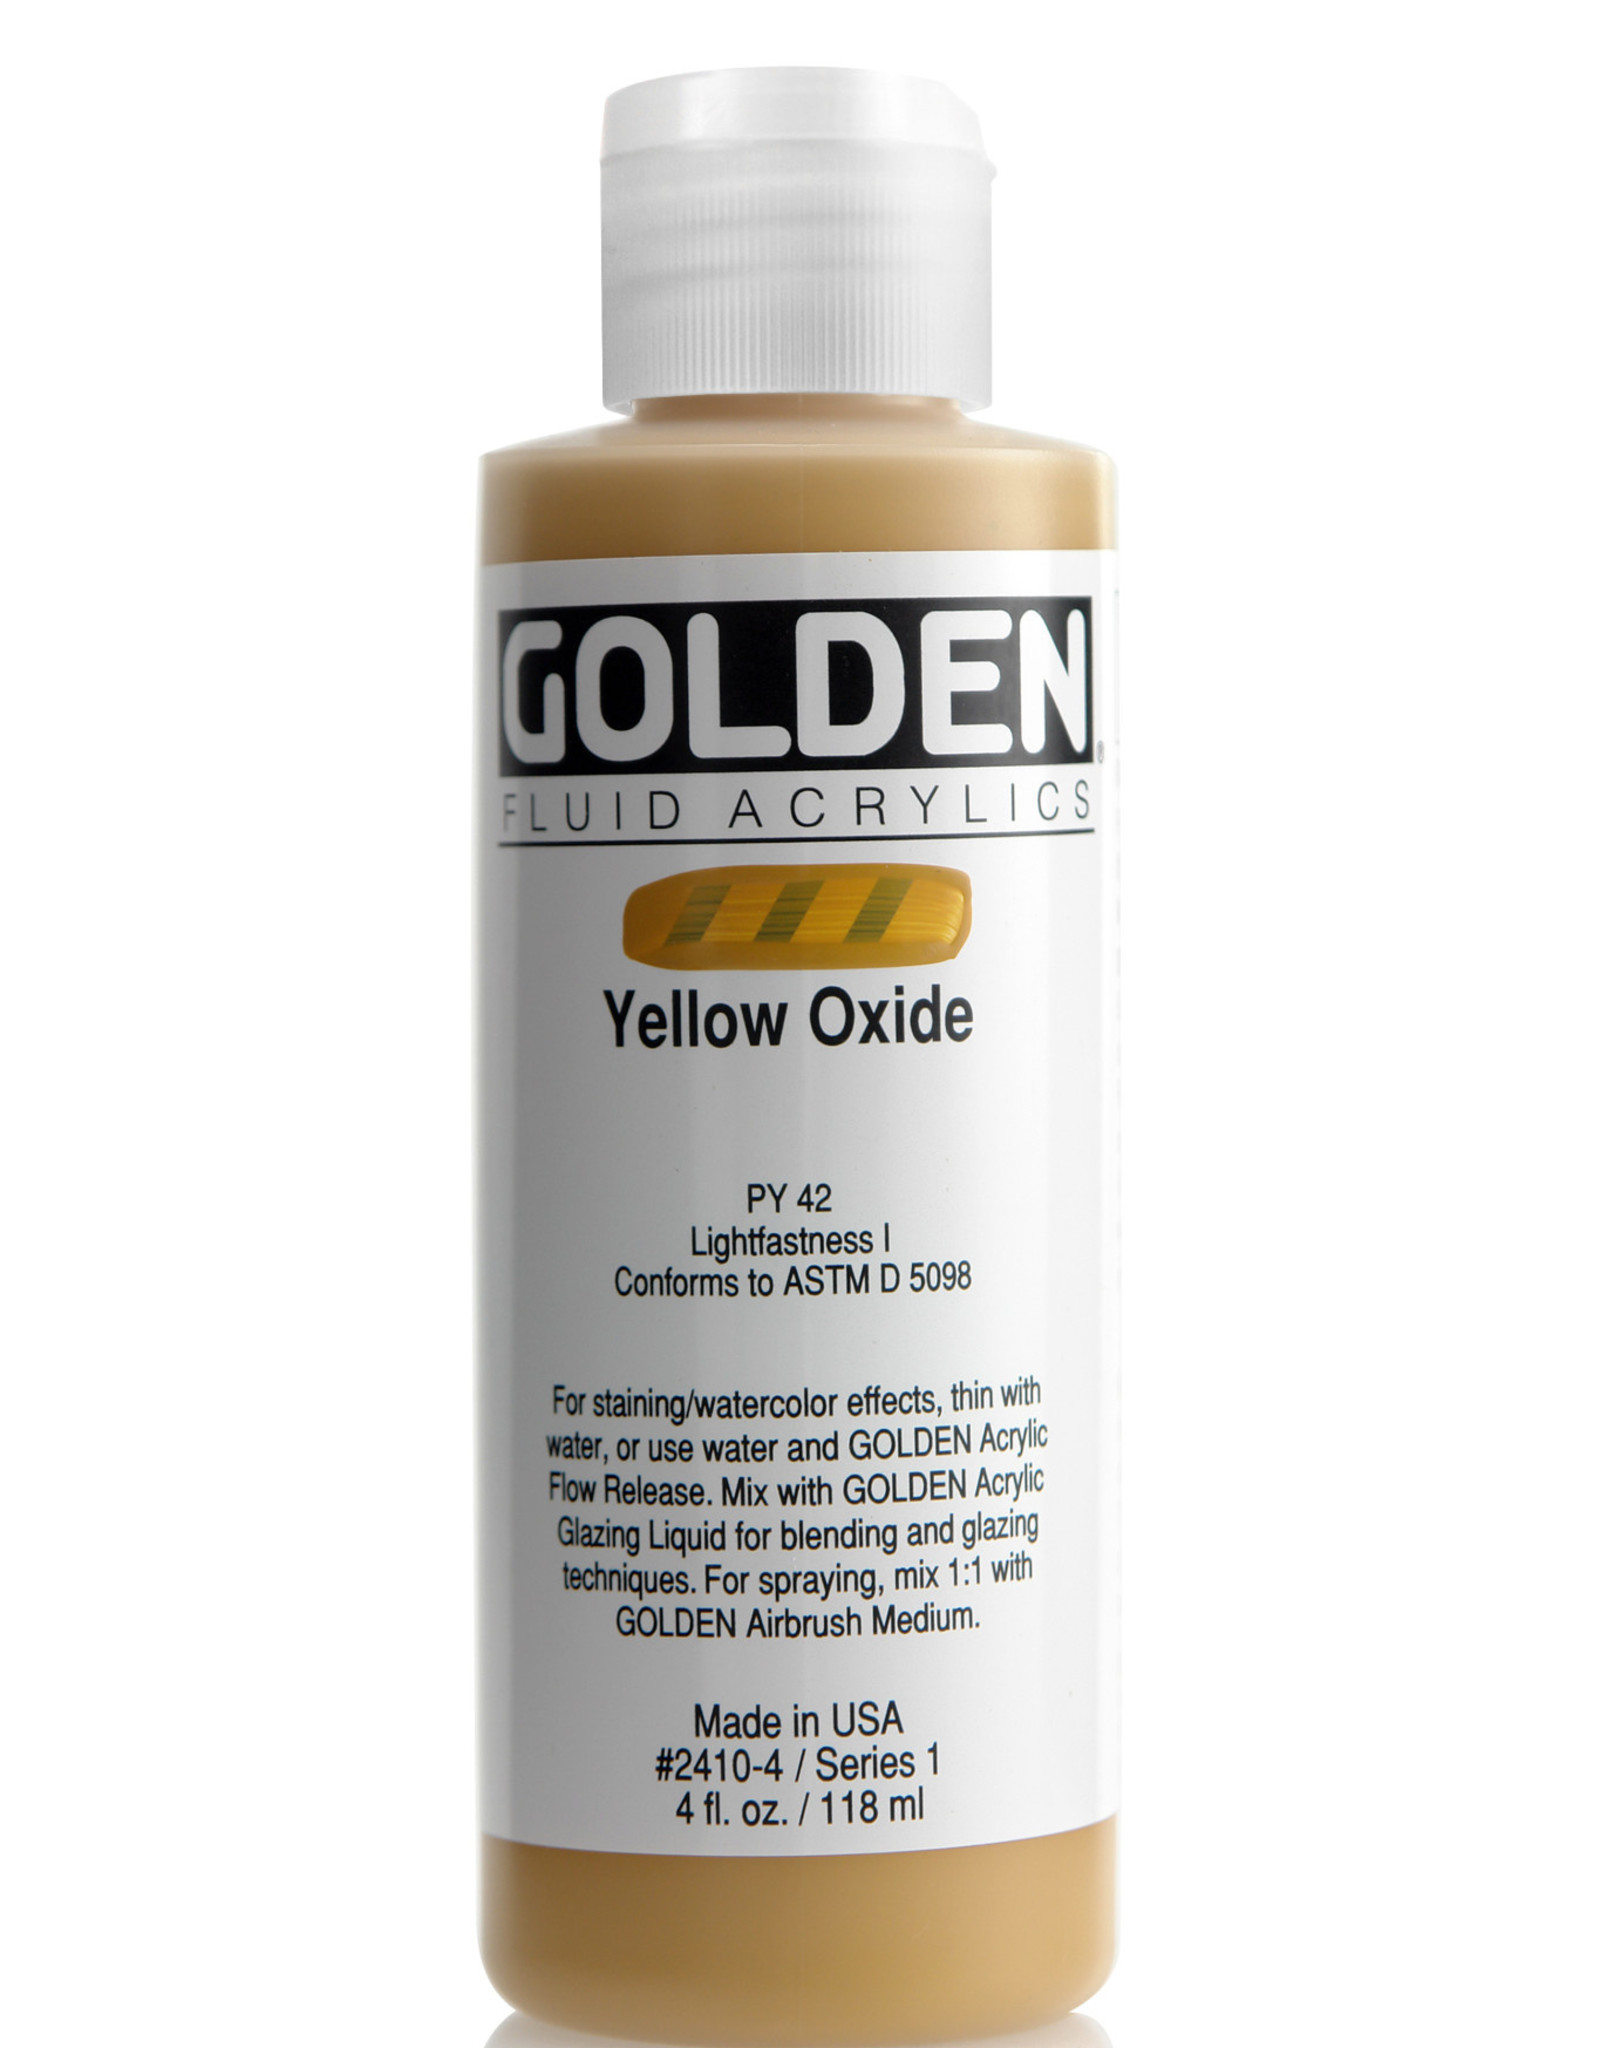 Golden Fluid Acrylic Paint, Yellow Oxide, Series 1, 4fl.oz, Bottle